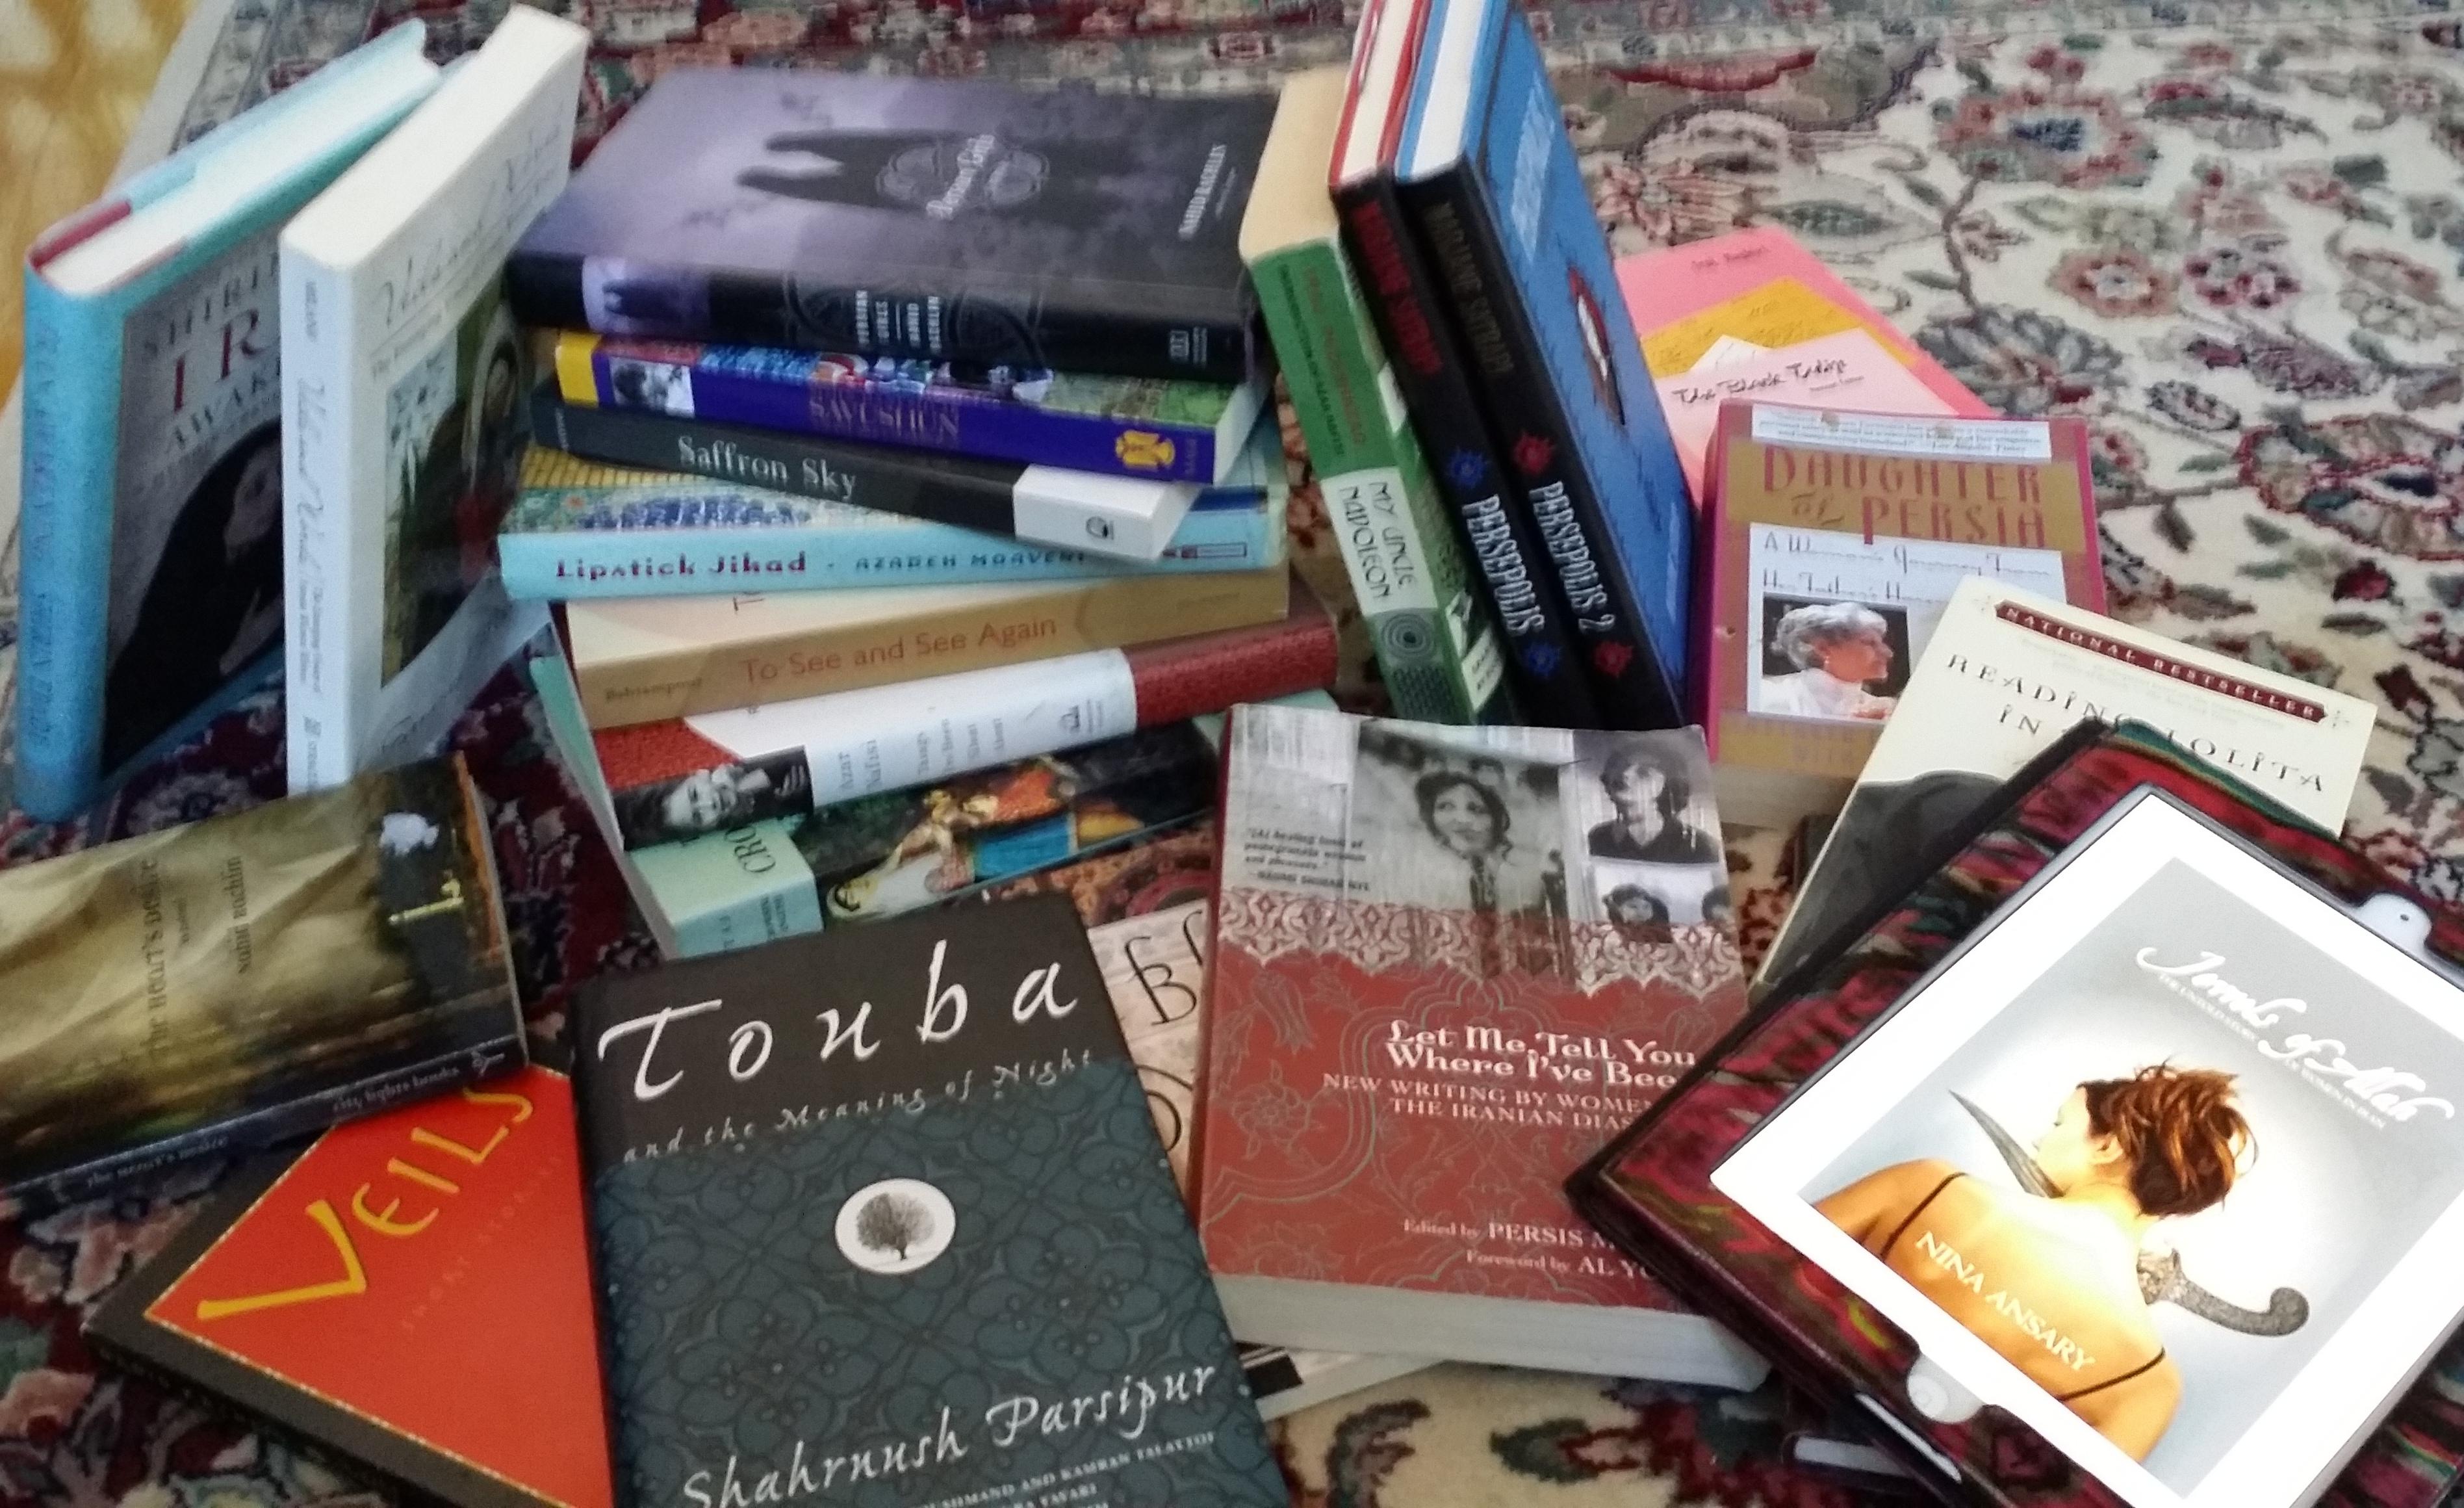 Real Persian Writing To Know And Love Catherine Dehdashti